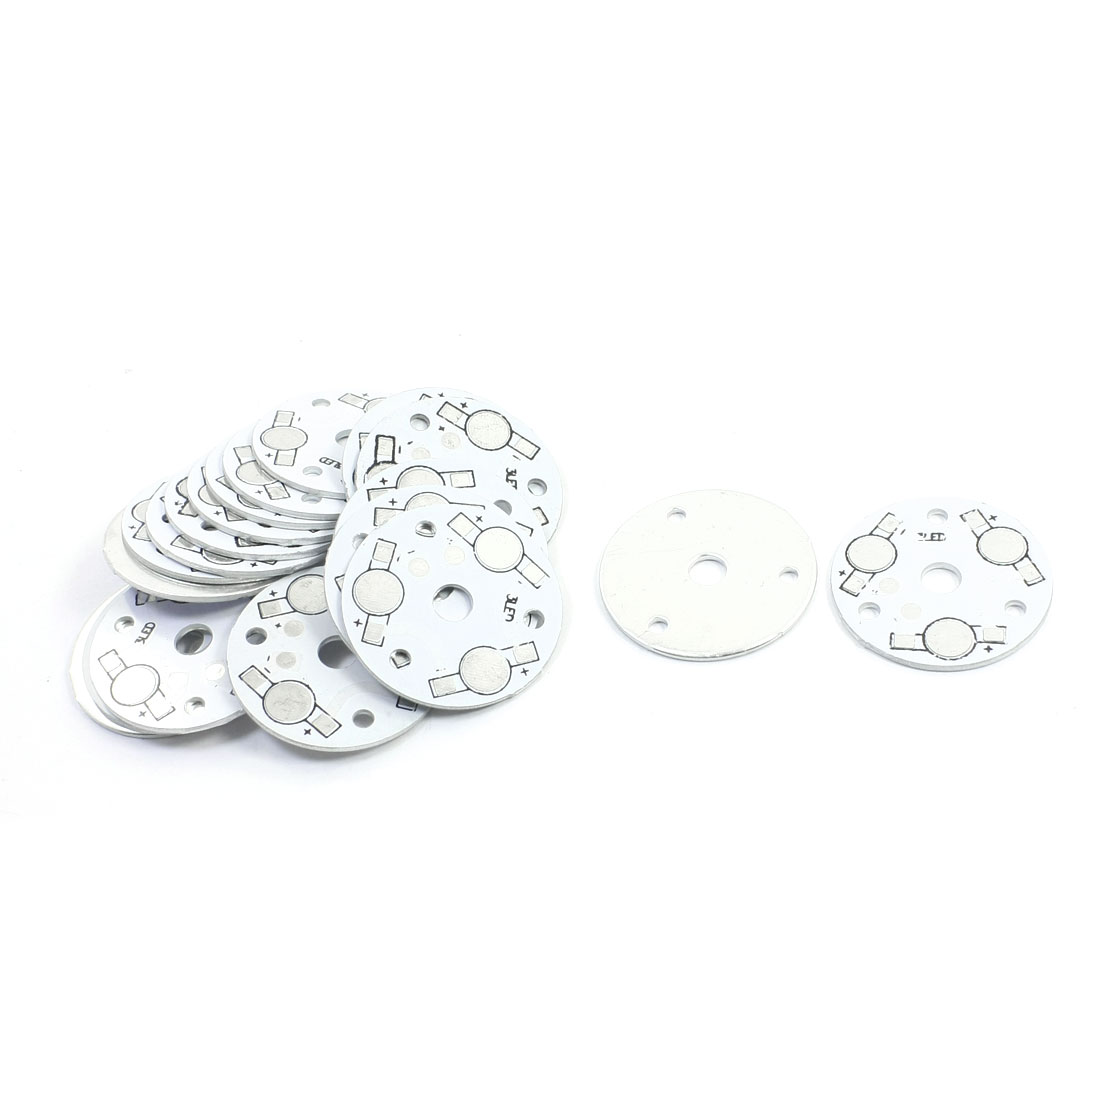 20pcs 35mm 3 x 1W/3W/5W LED Round Aluminum PCB Circuit Board Base Plate